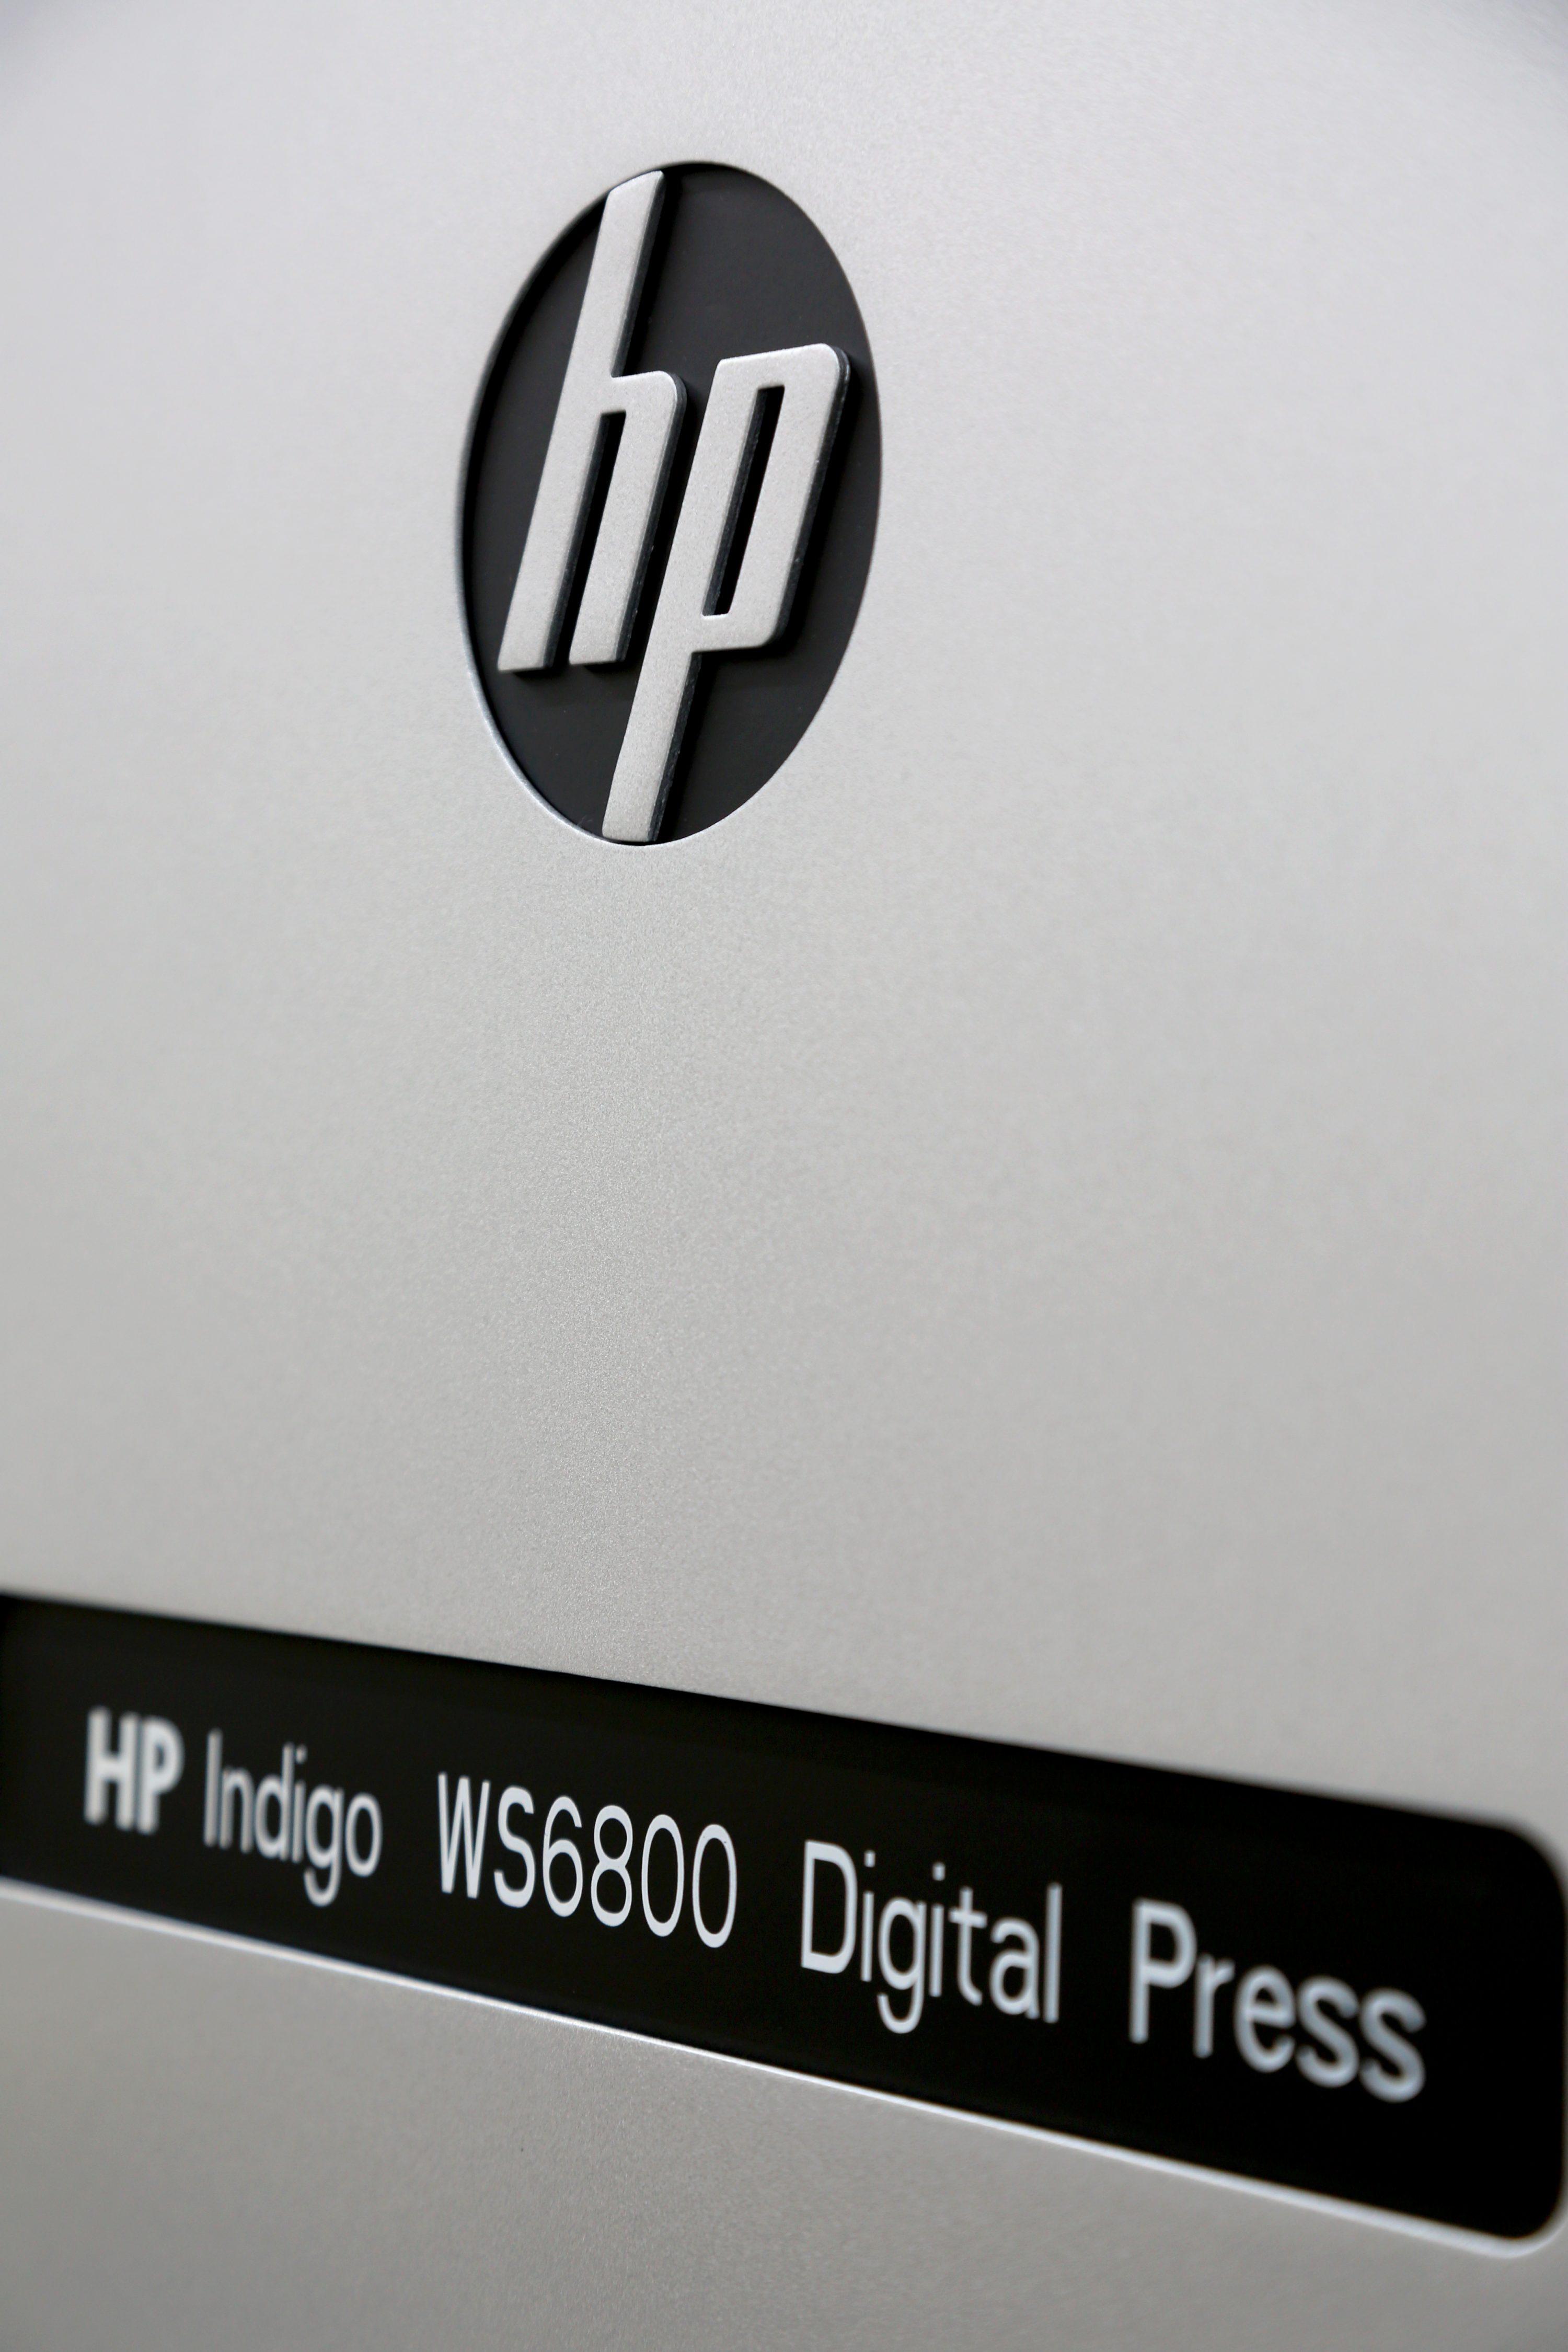 HPIndigo6800